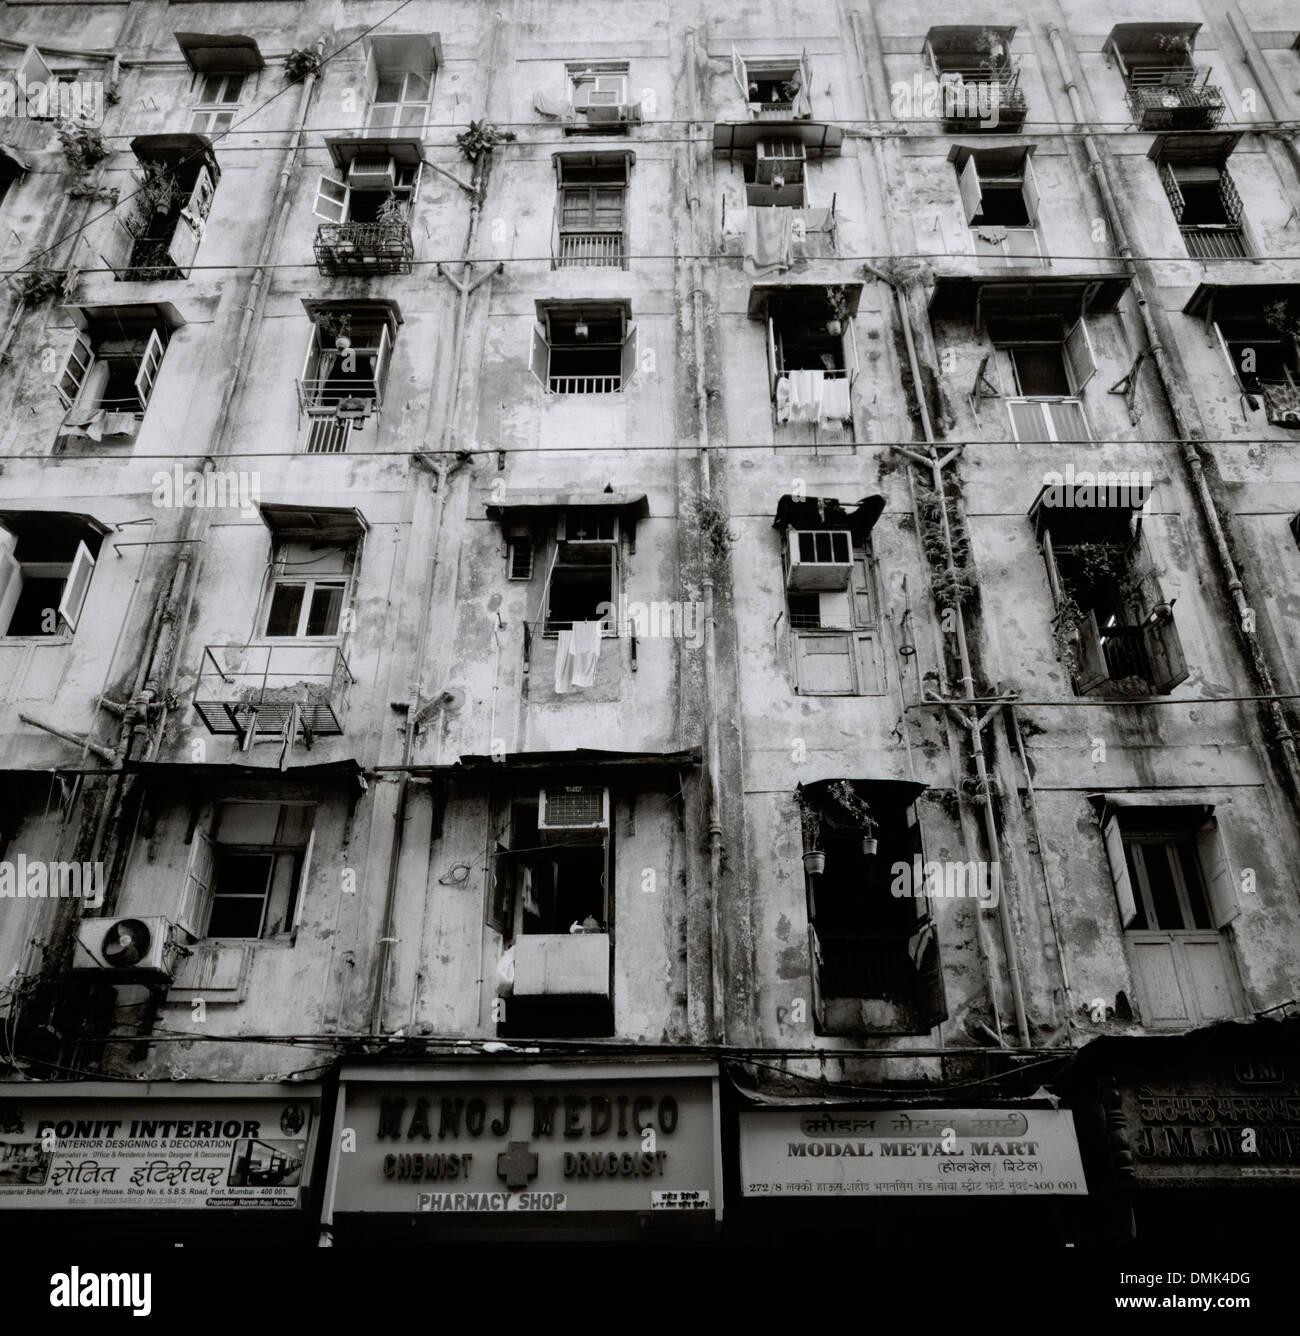 Poor Apartments: Inner City Poverty Stock Photos & Inner City Poverty Stock